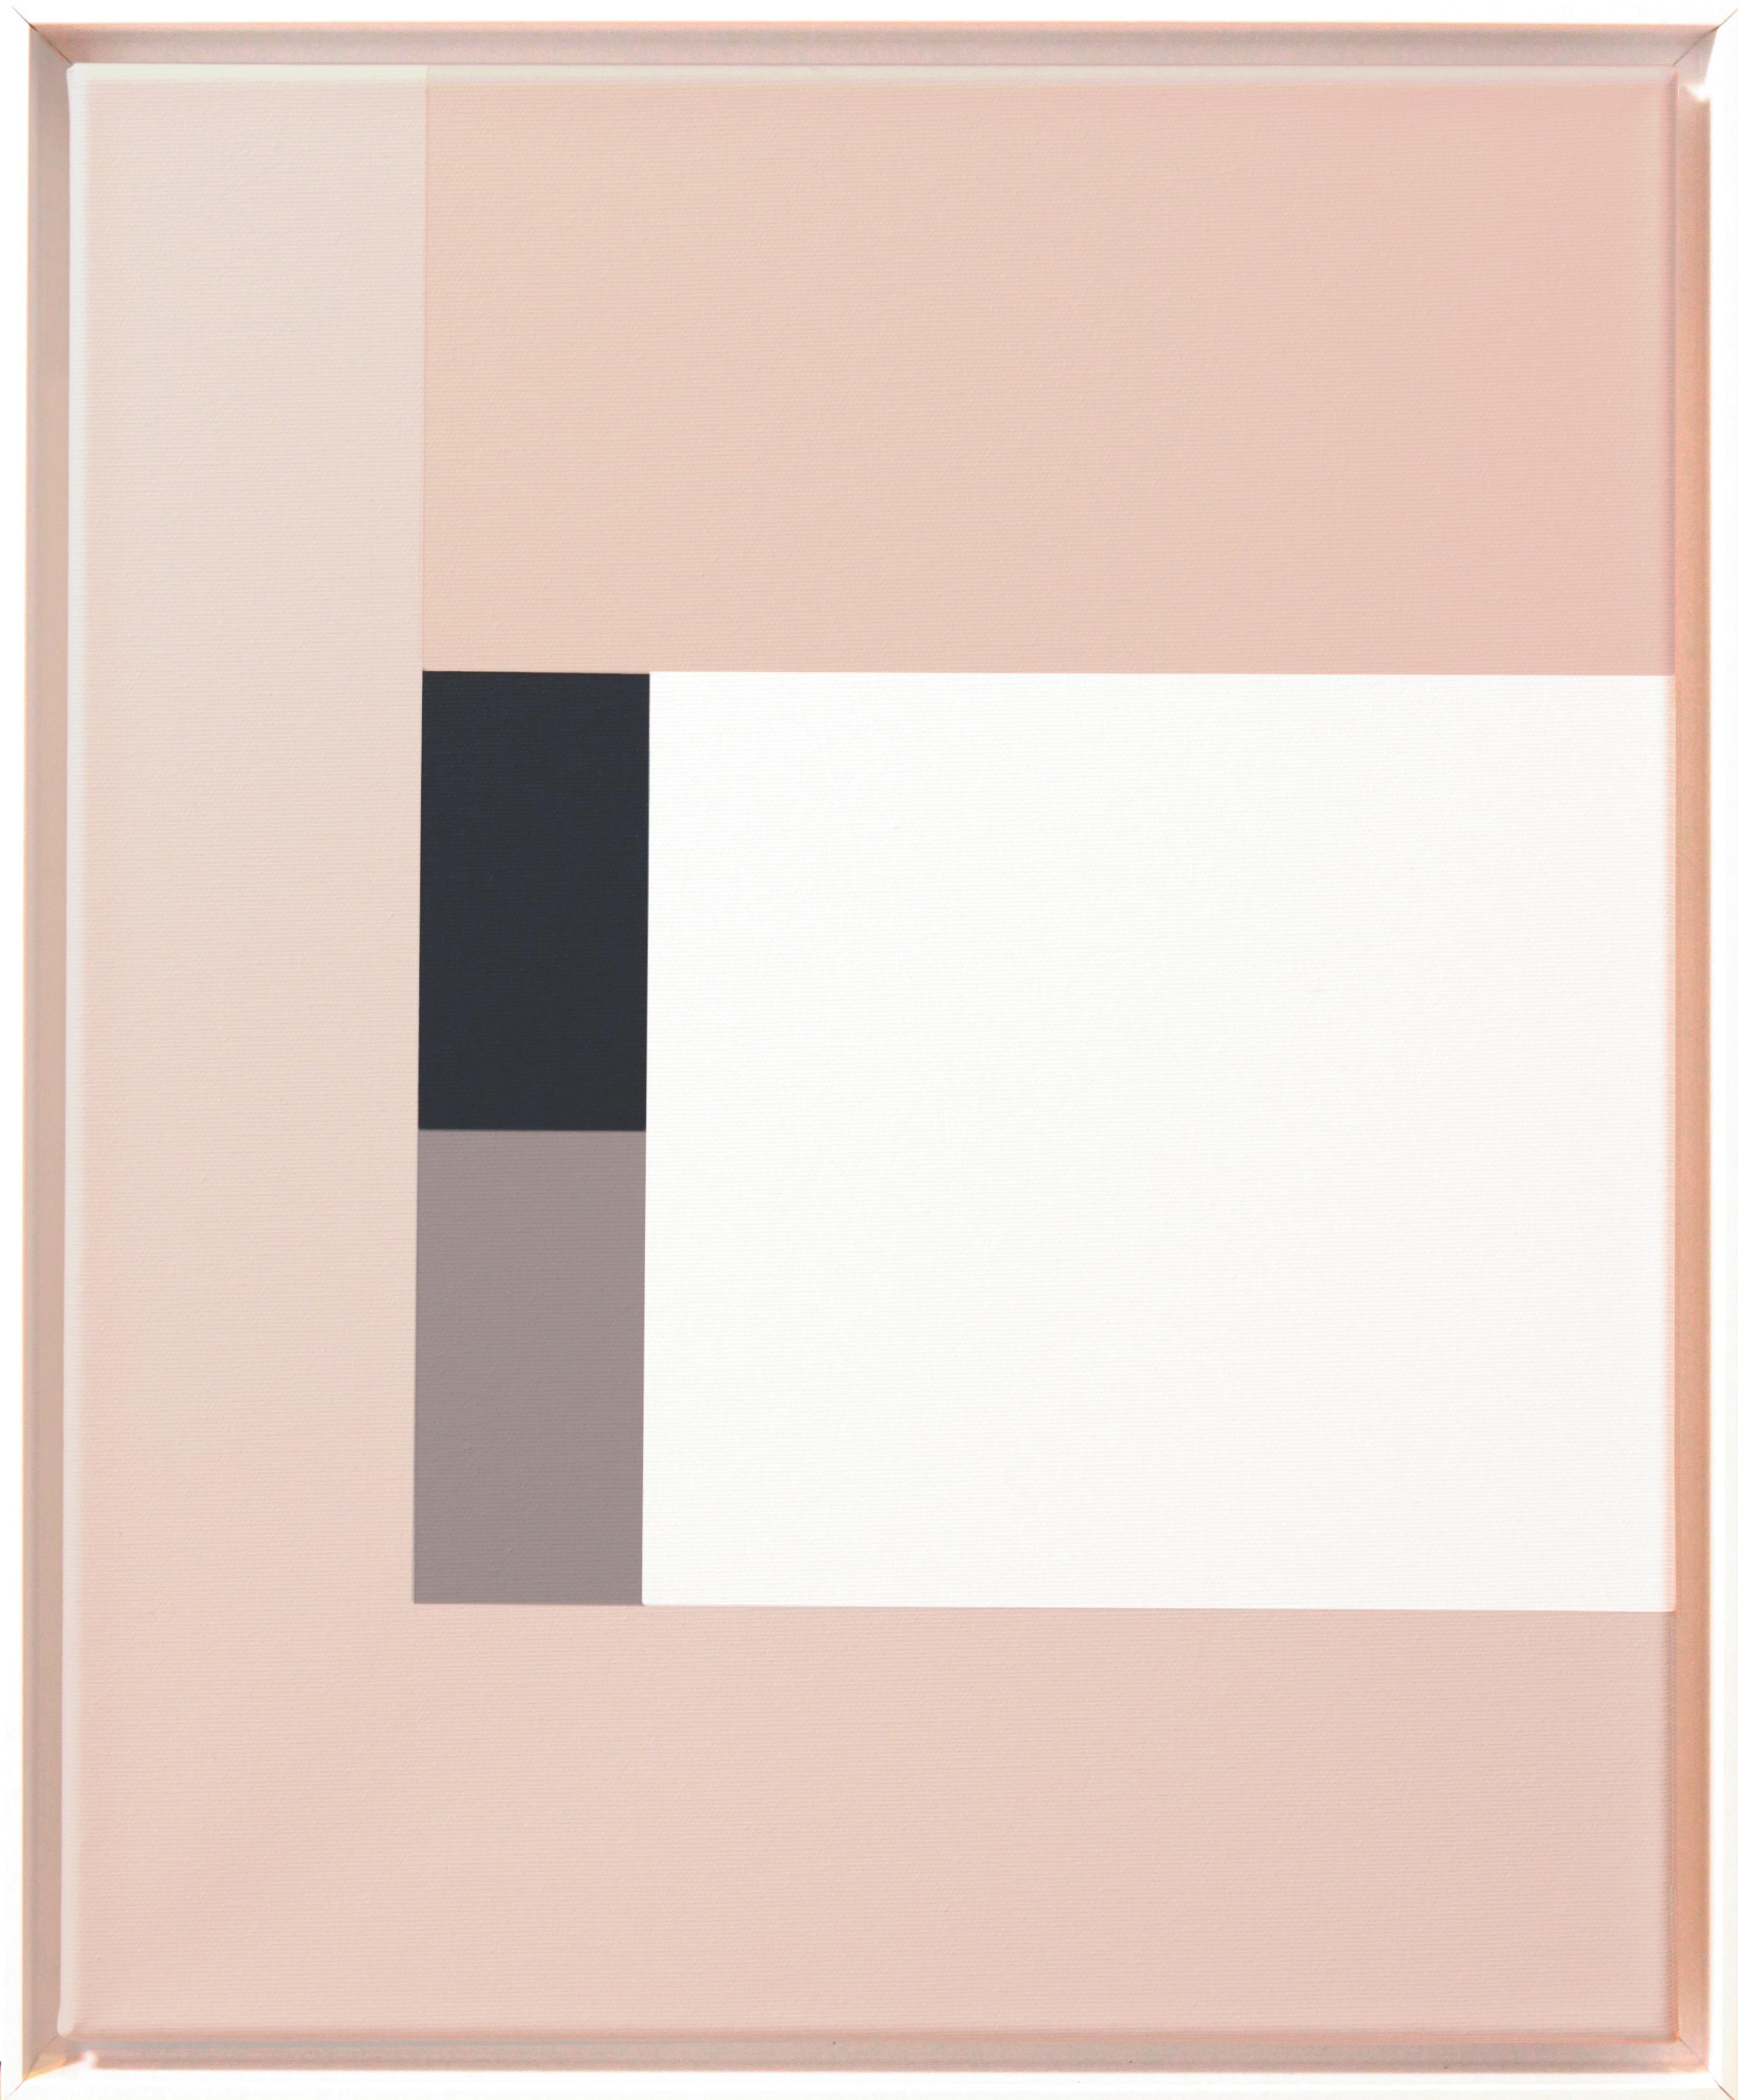 Claudia Fauth Simplicity Of Art S51 Acrylic on Canvas 2020